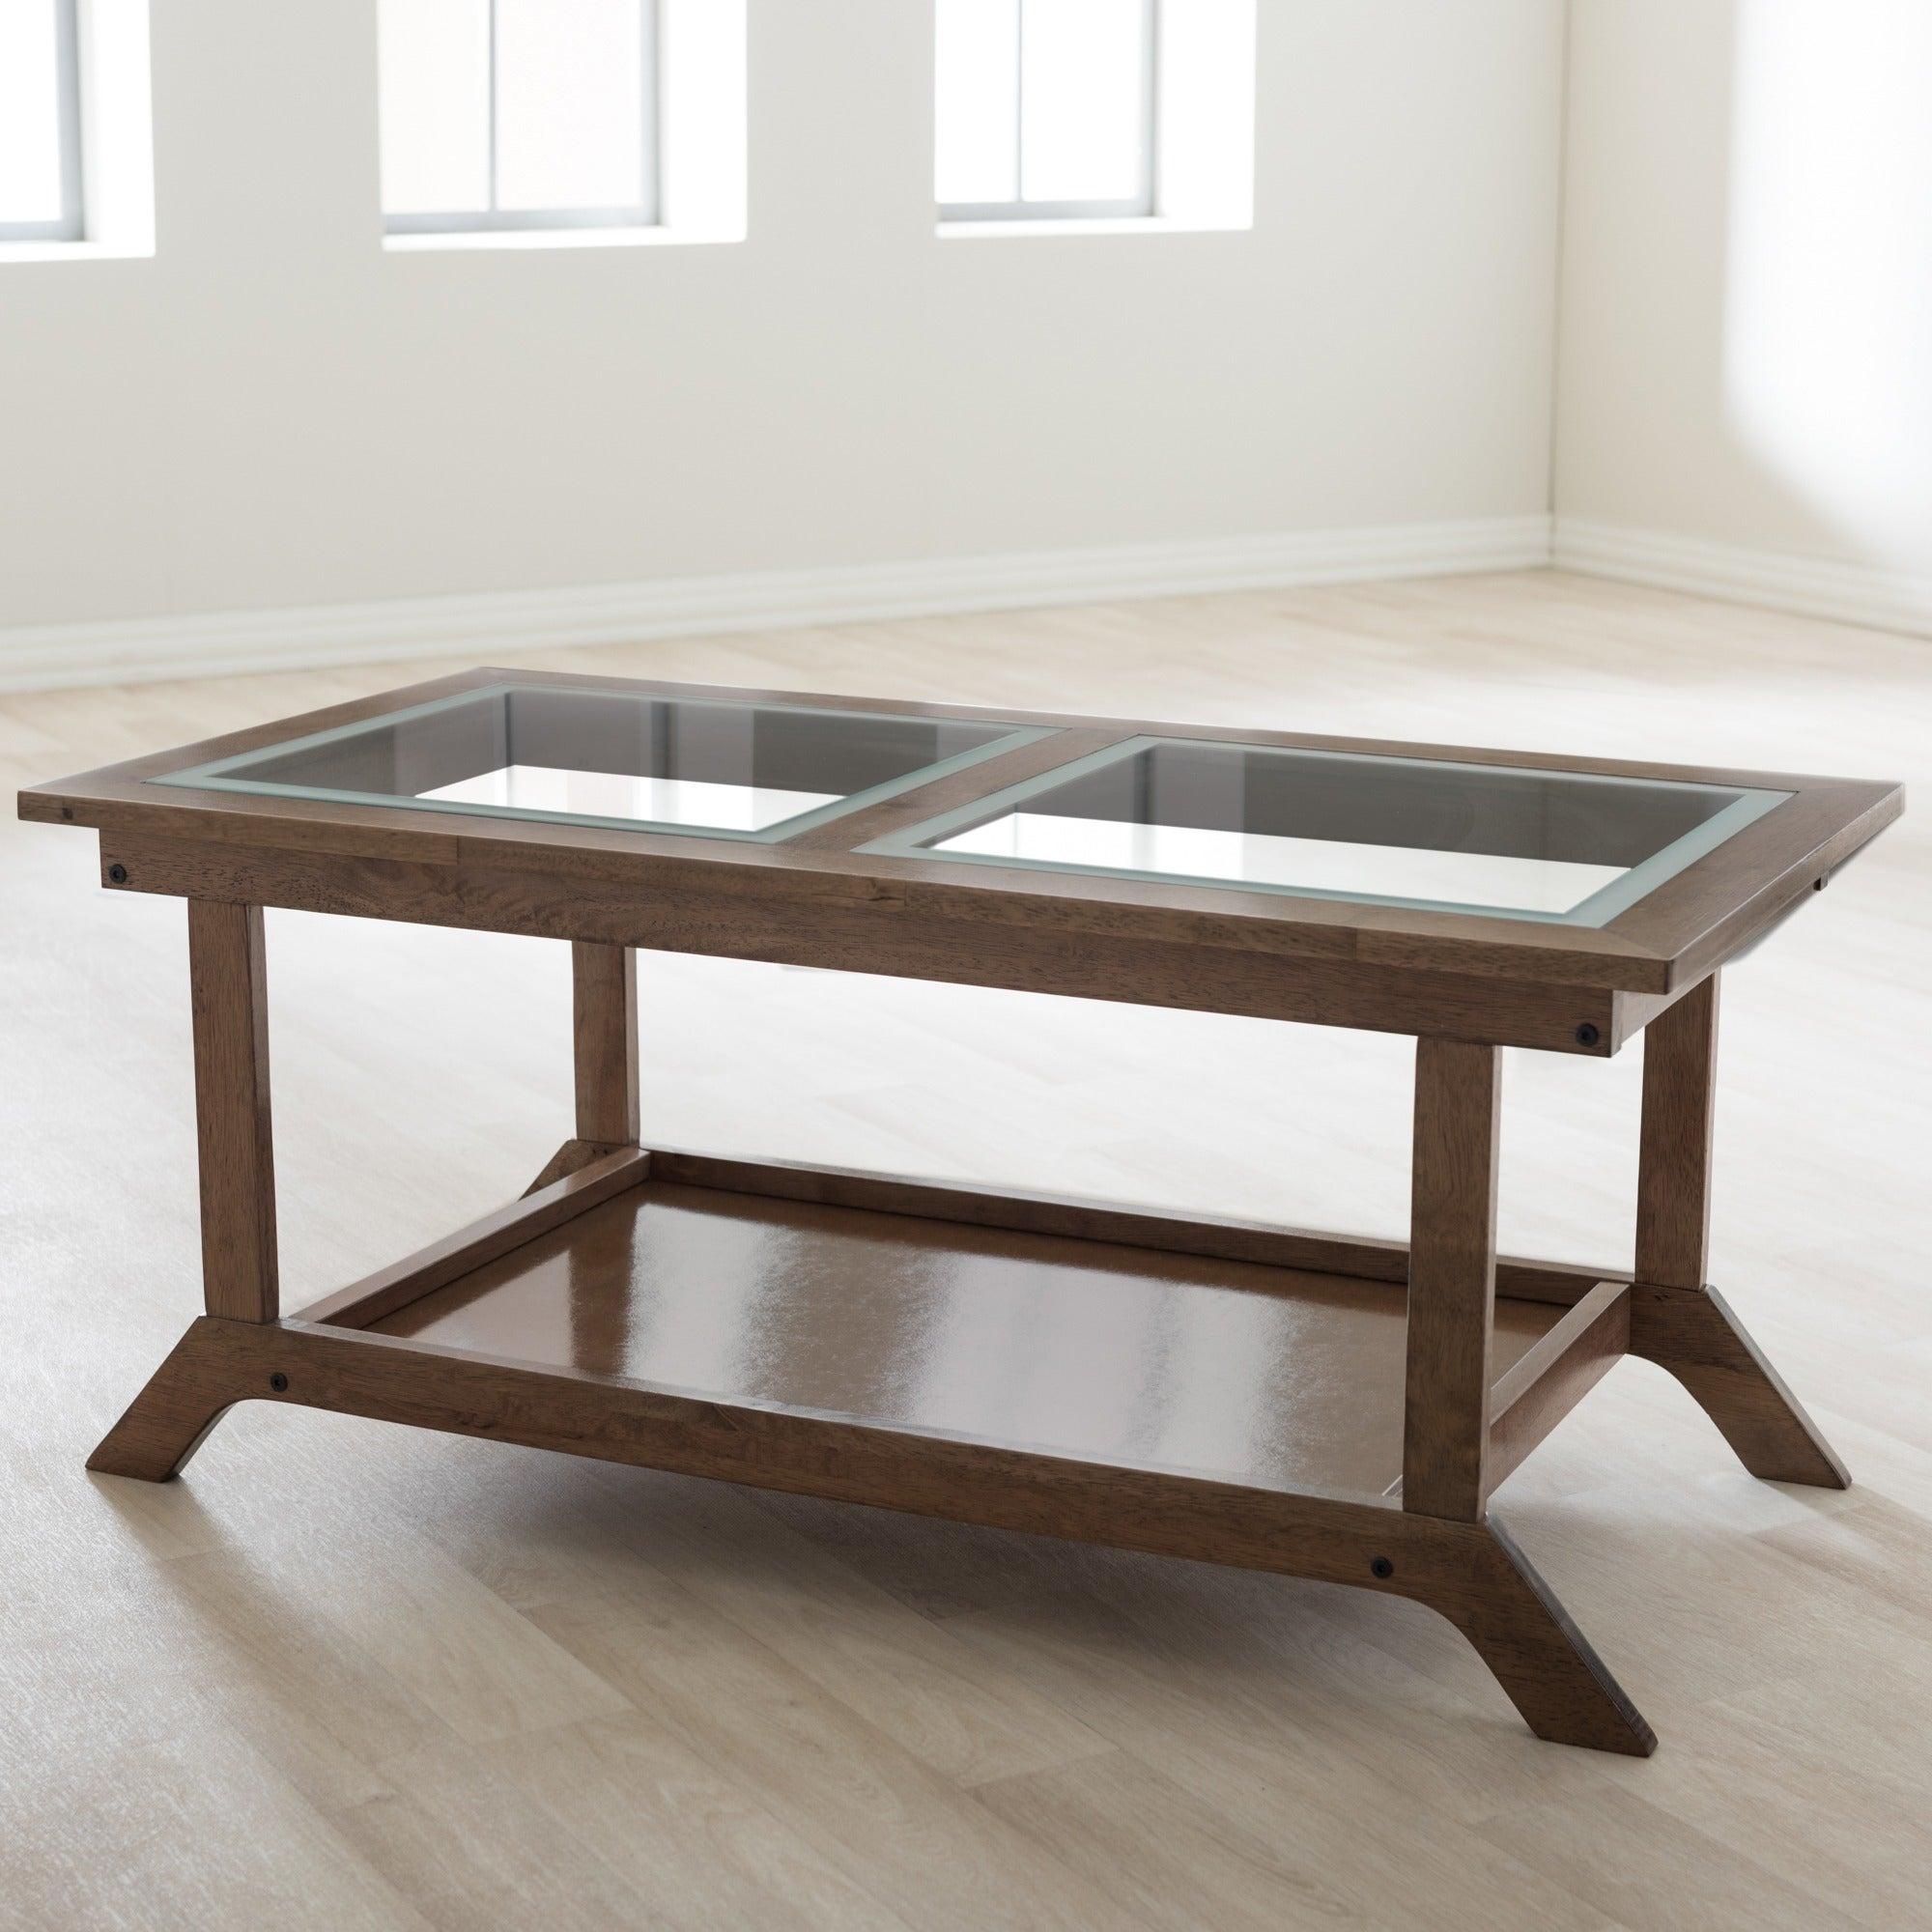 Baxton Studio Cymone Mid Century Modern Walnut Wood Living Room Glass Top Coffee Table